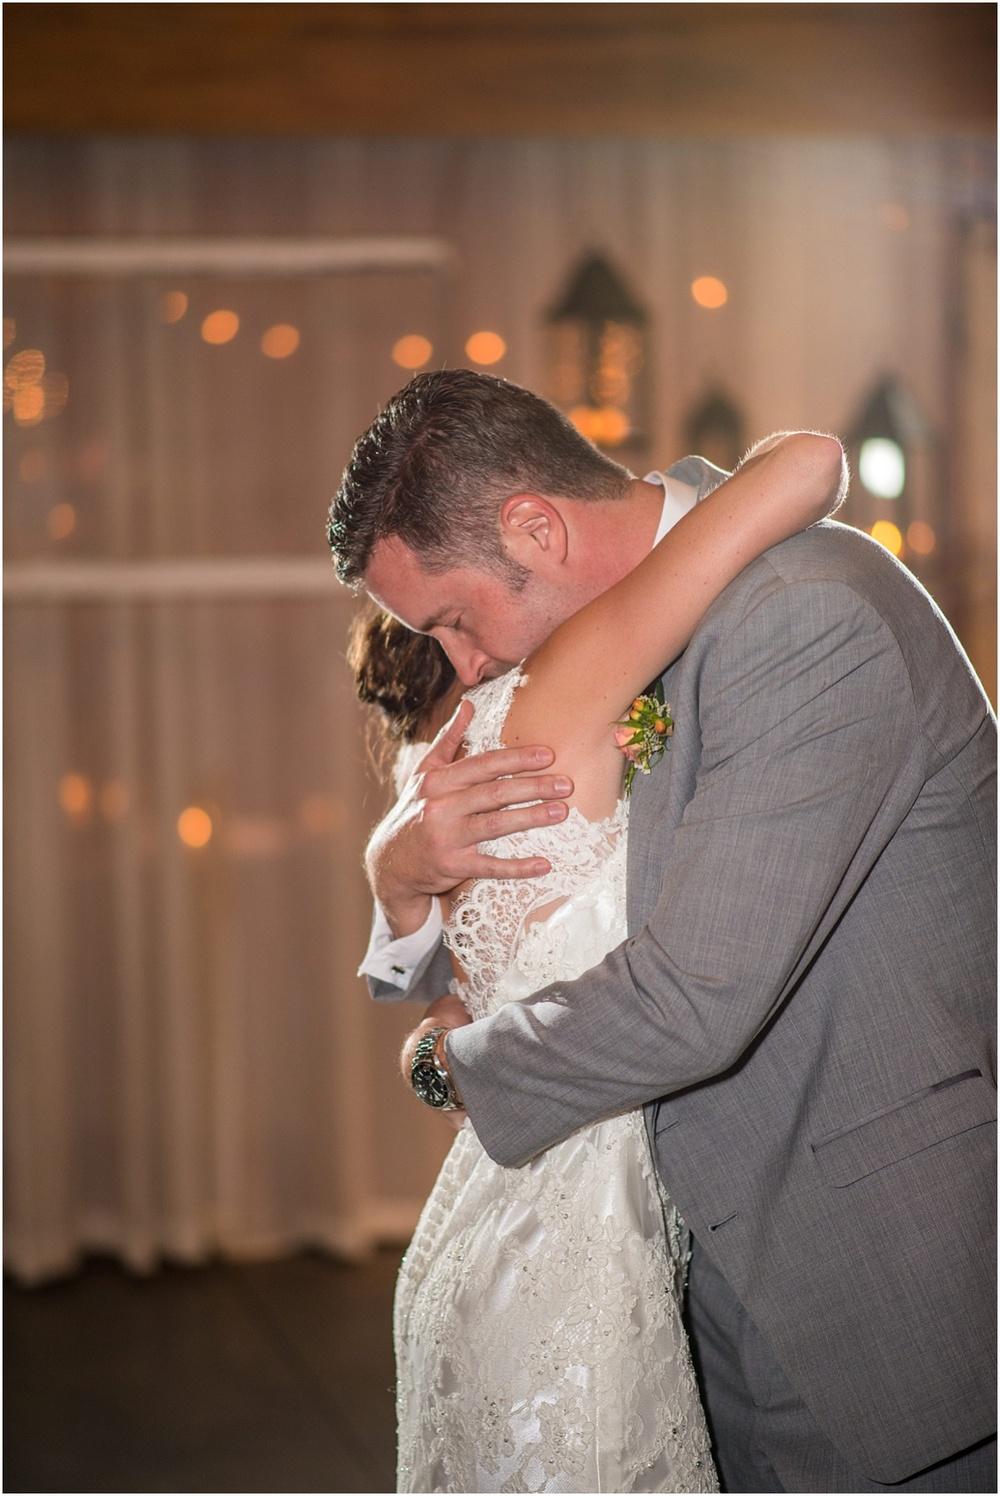 Greg Smit Photography Nashville wedding photographer Mint Springs Farm_0109